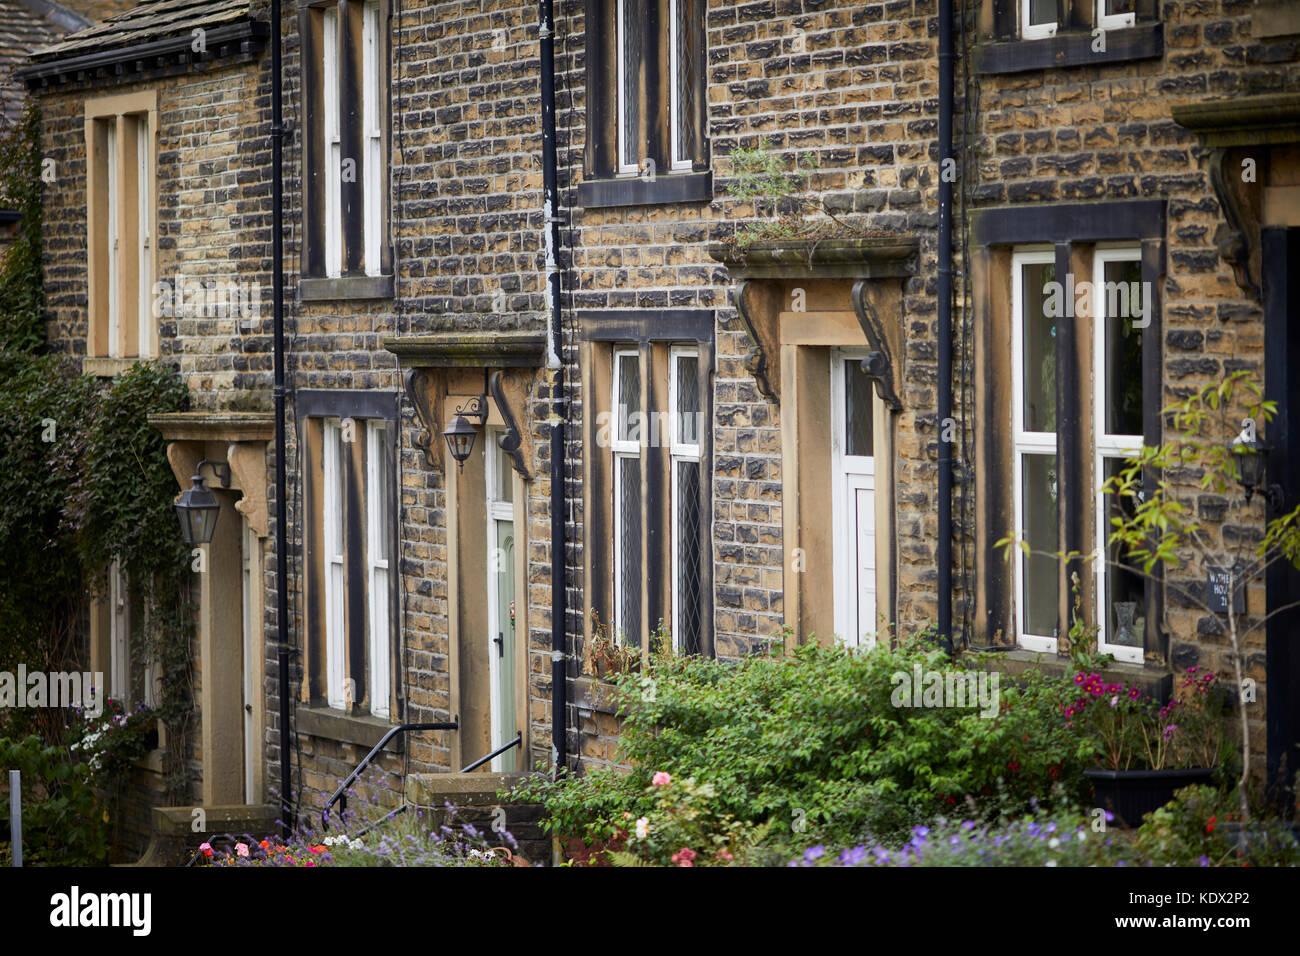 Pennines village, Haworth in West Yorkshire, England. stone terraced cottages on Bridgehouse Lane Stock Photo